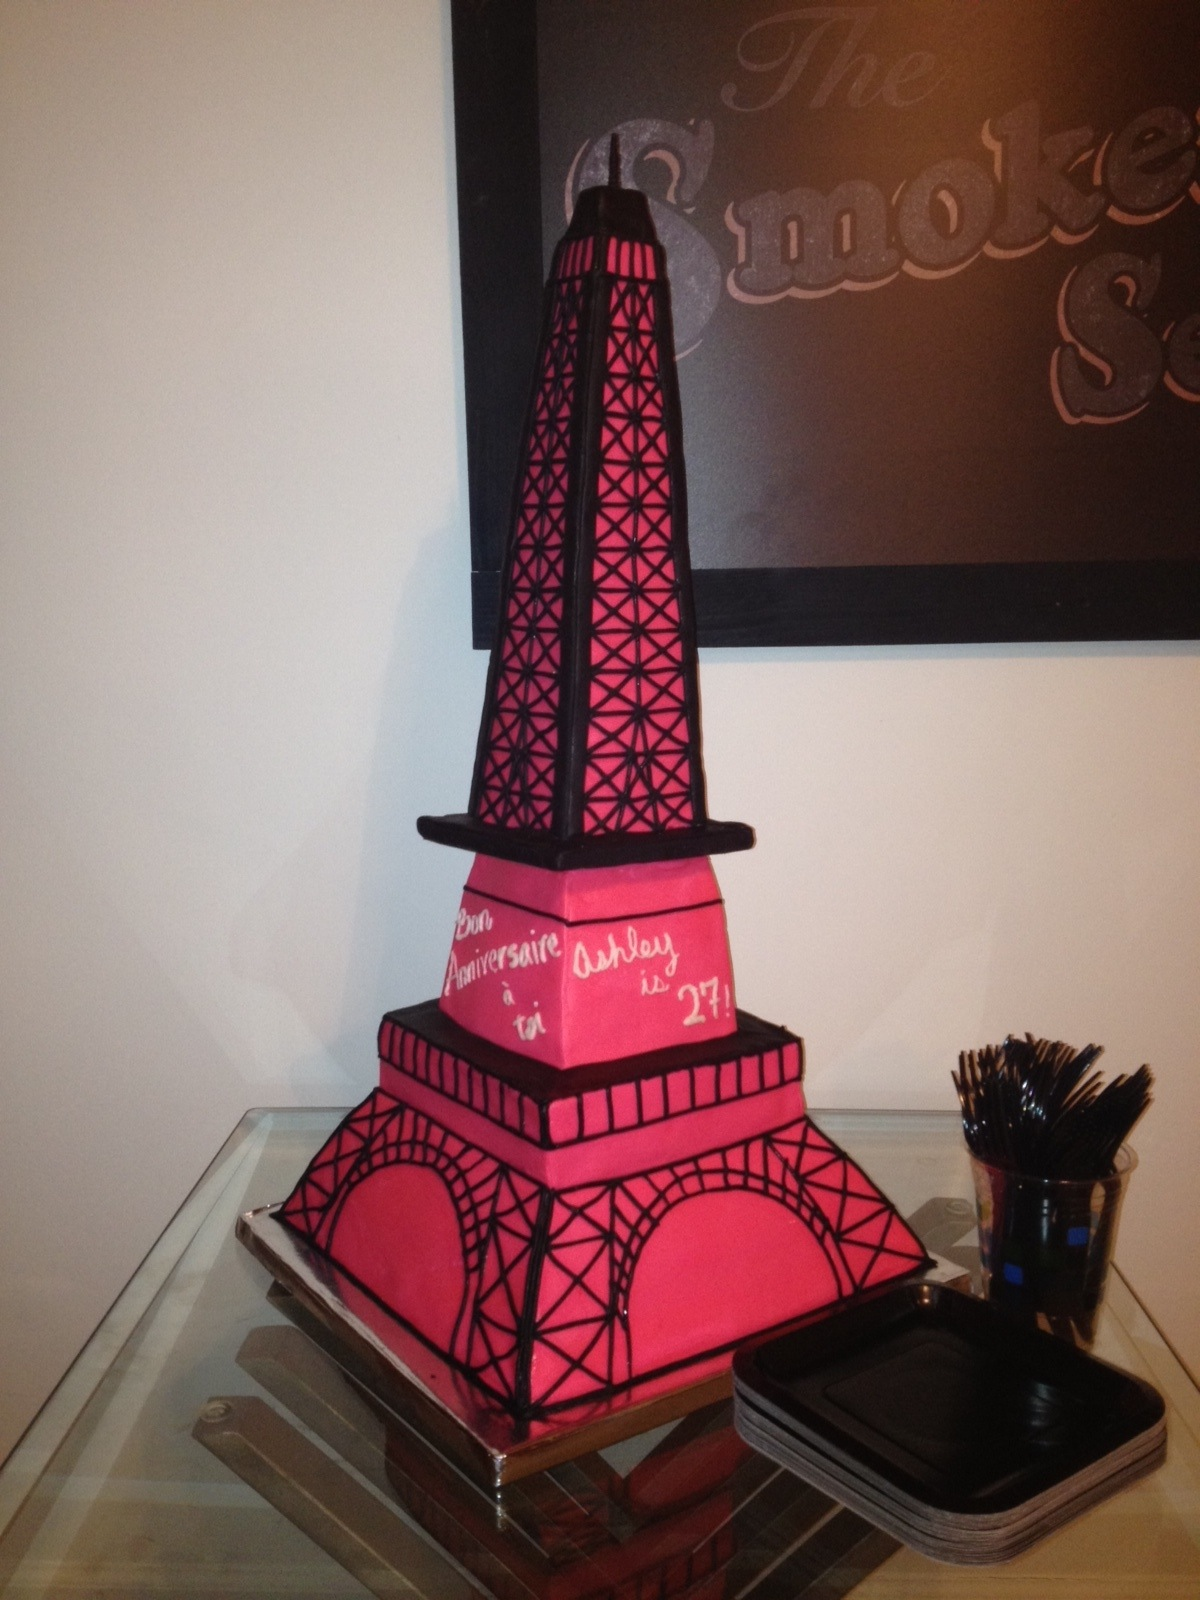 Surprising Eiffel Tower Cakes Decoration Ideas Little Birthday Cakes Funny Birthday Cards Online Aeocydamsfinfo